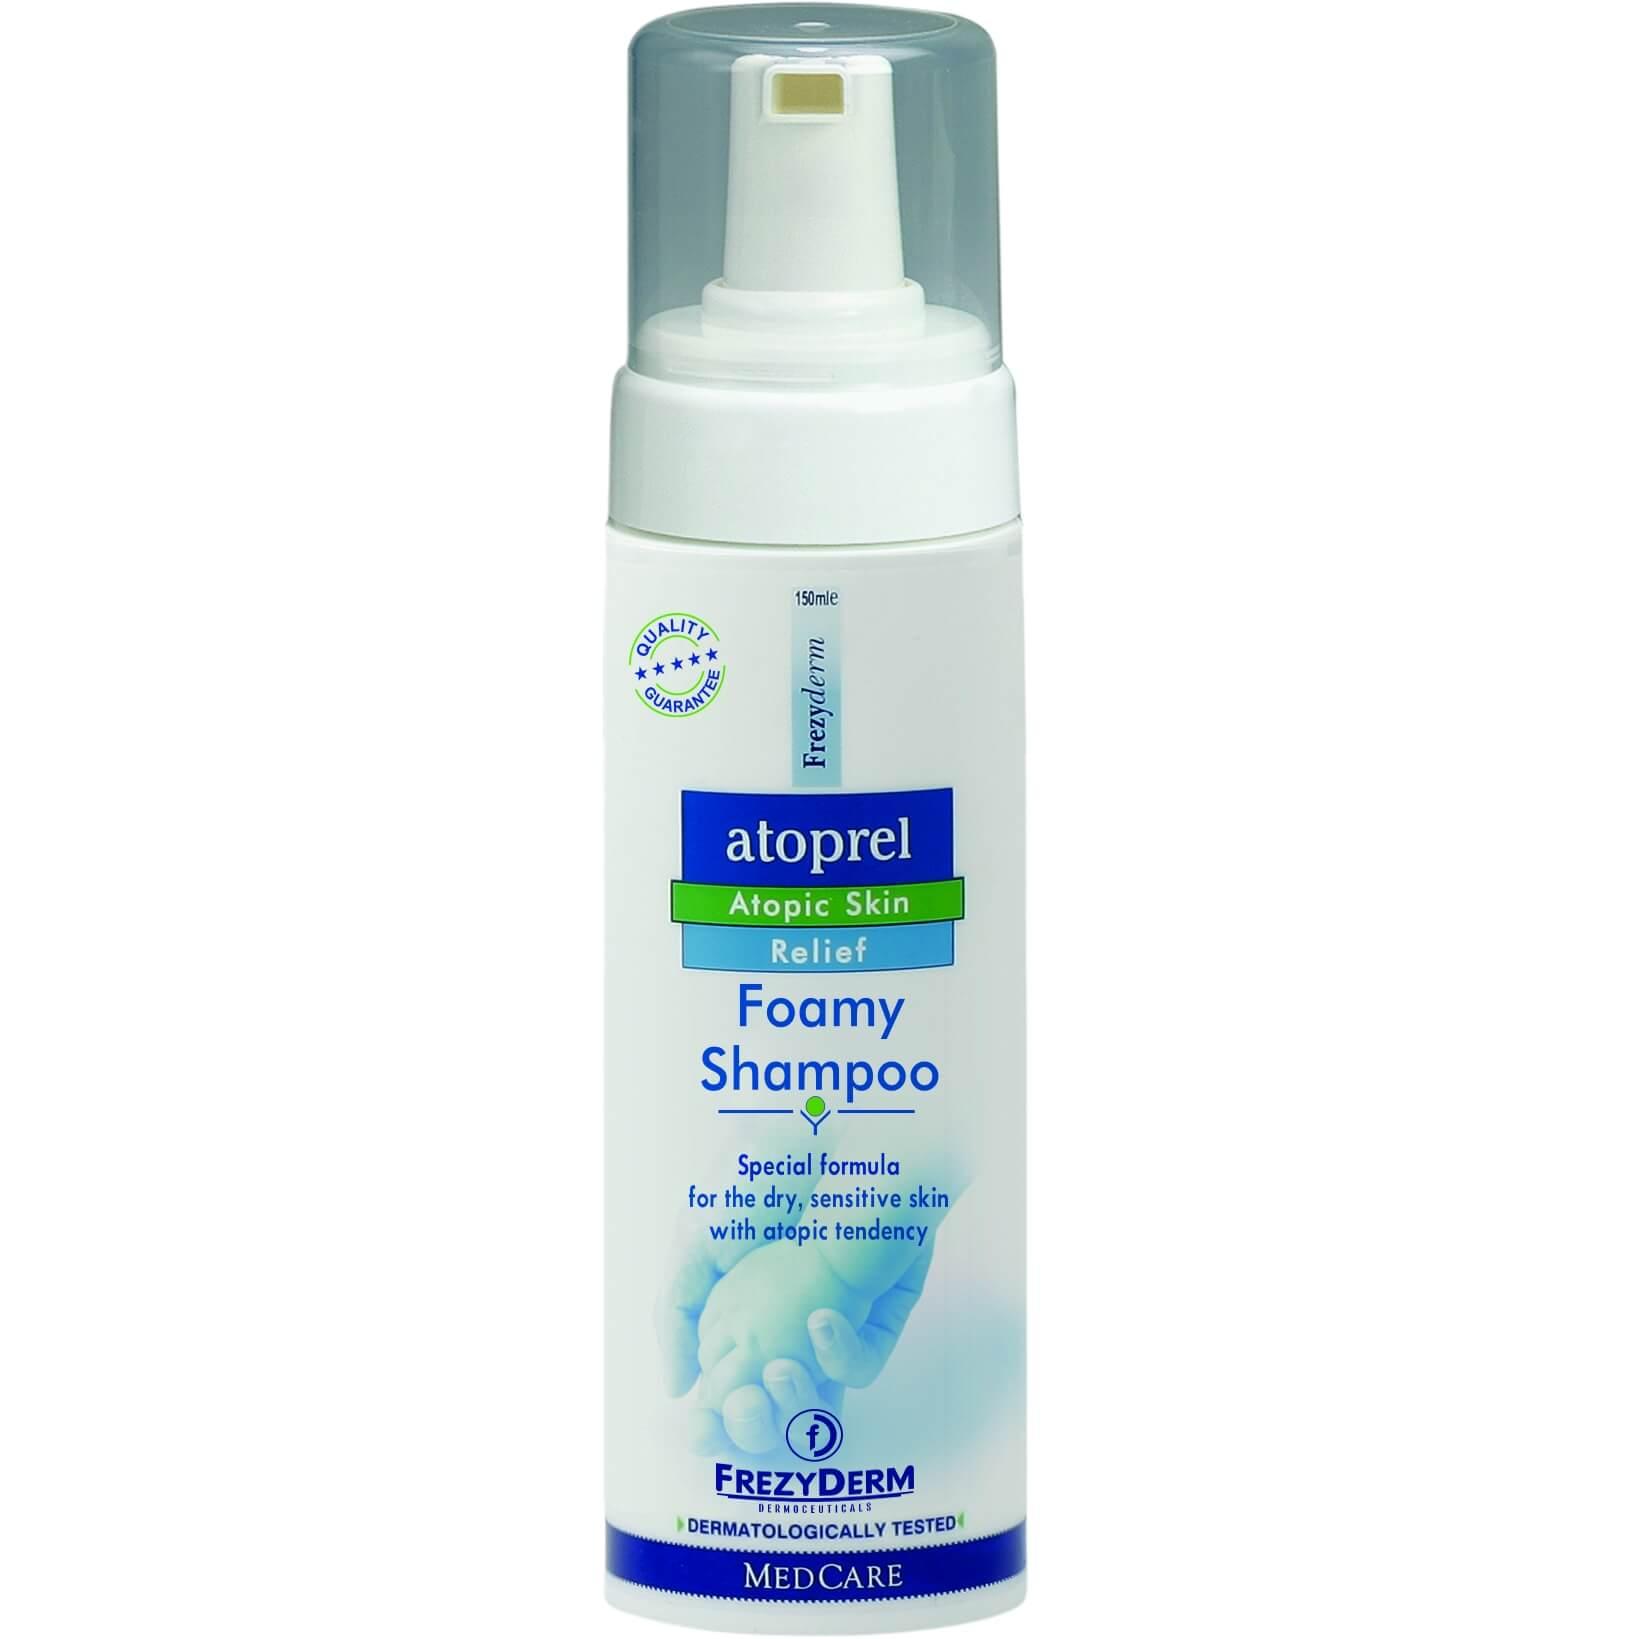 Frezyderm Atoprel Foamy ShampooΕιδικό Σαμπουάν σε Μορφή Αφρού για Ξηρό Ευαίσθητο με Ατοπική Προδιάθεση Δέρμα 150ml